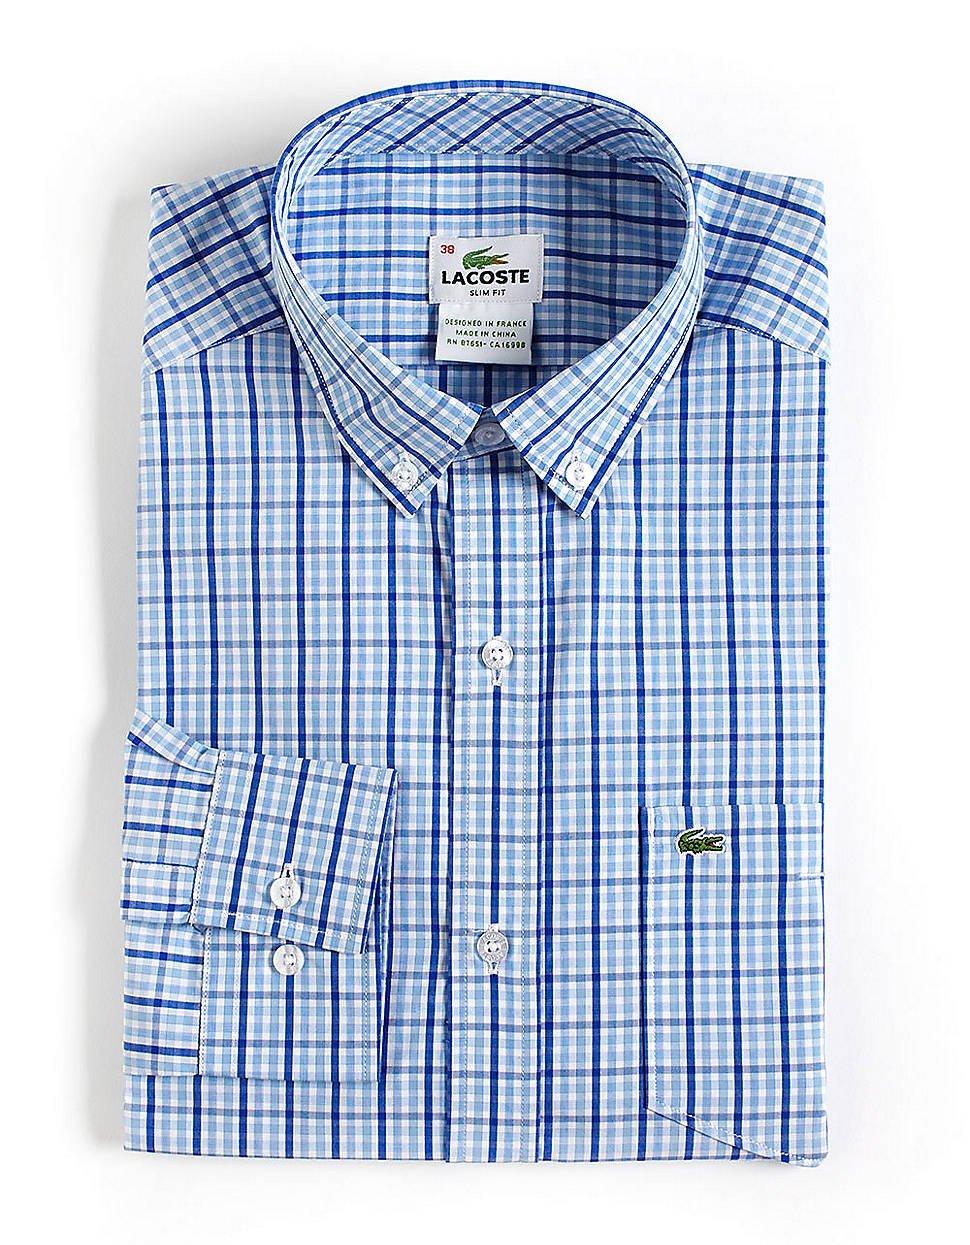 Mens Blue Plaid Dress Shirt